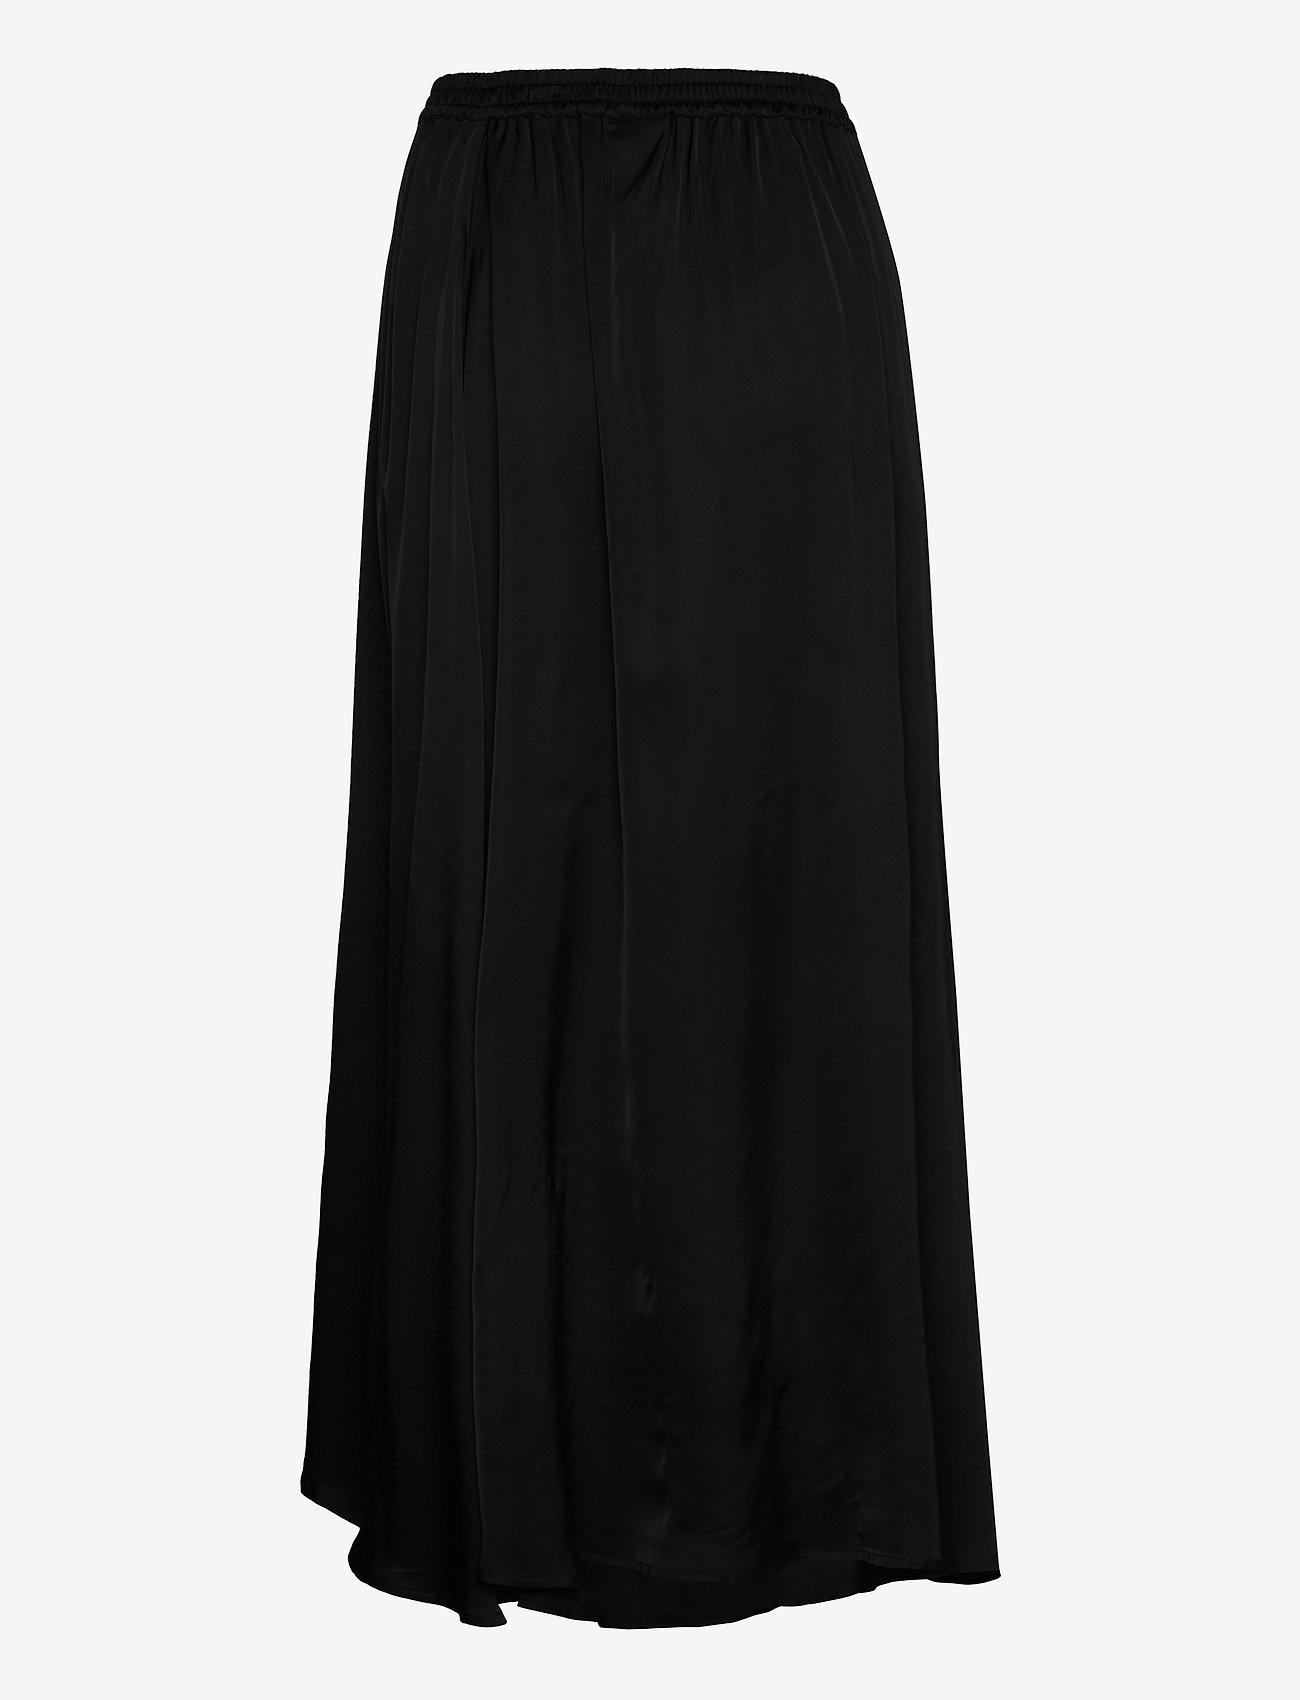 Mea Maxi Skirt (Black) (1715 kr) - DESIGNERS, REMIX